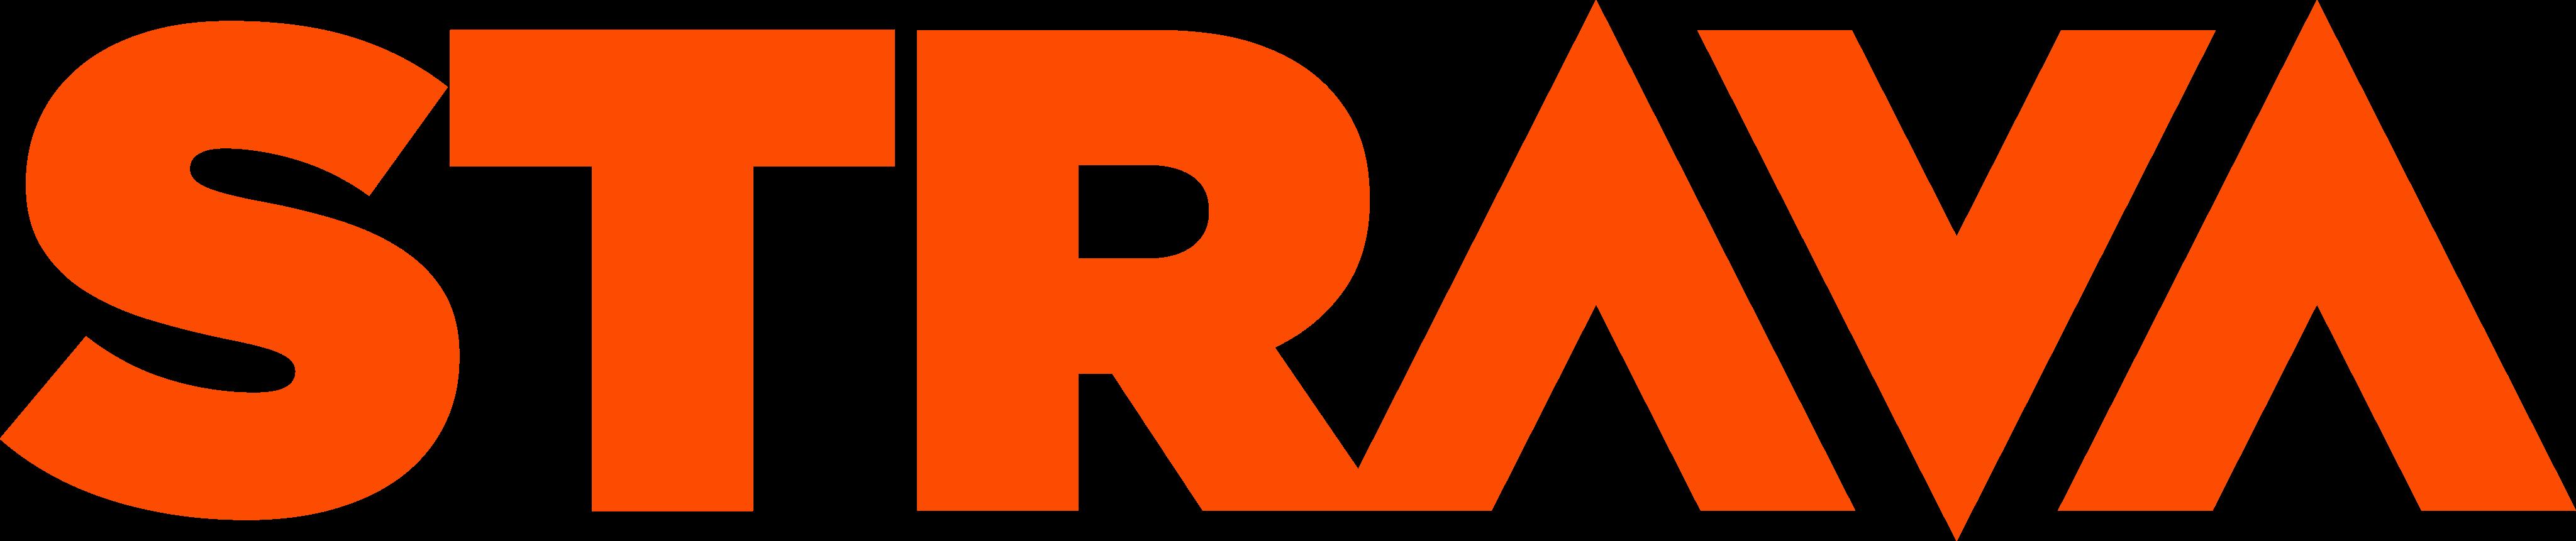 Strava Logo.